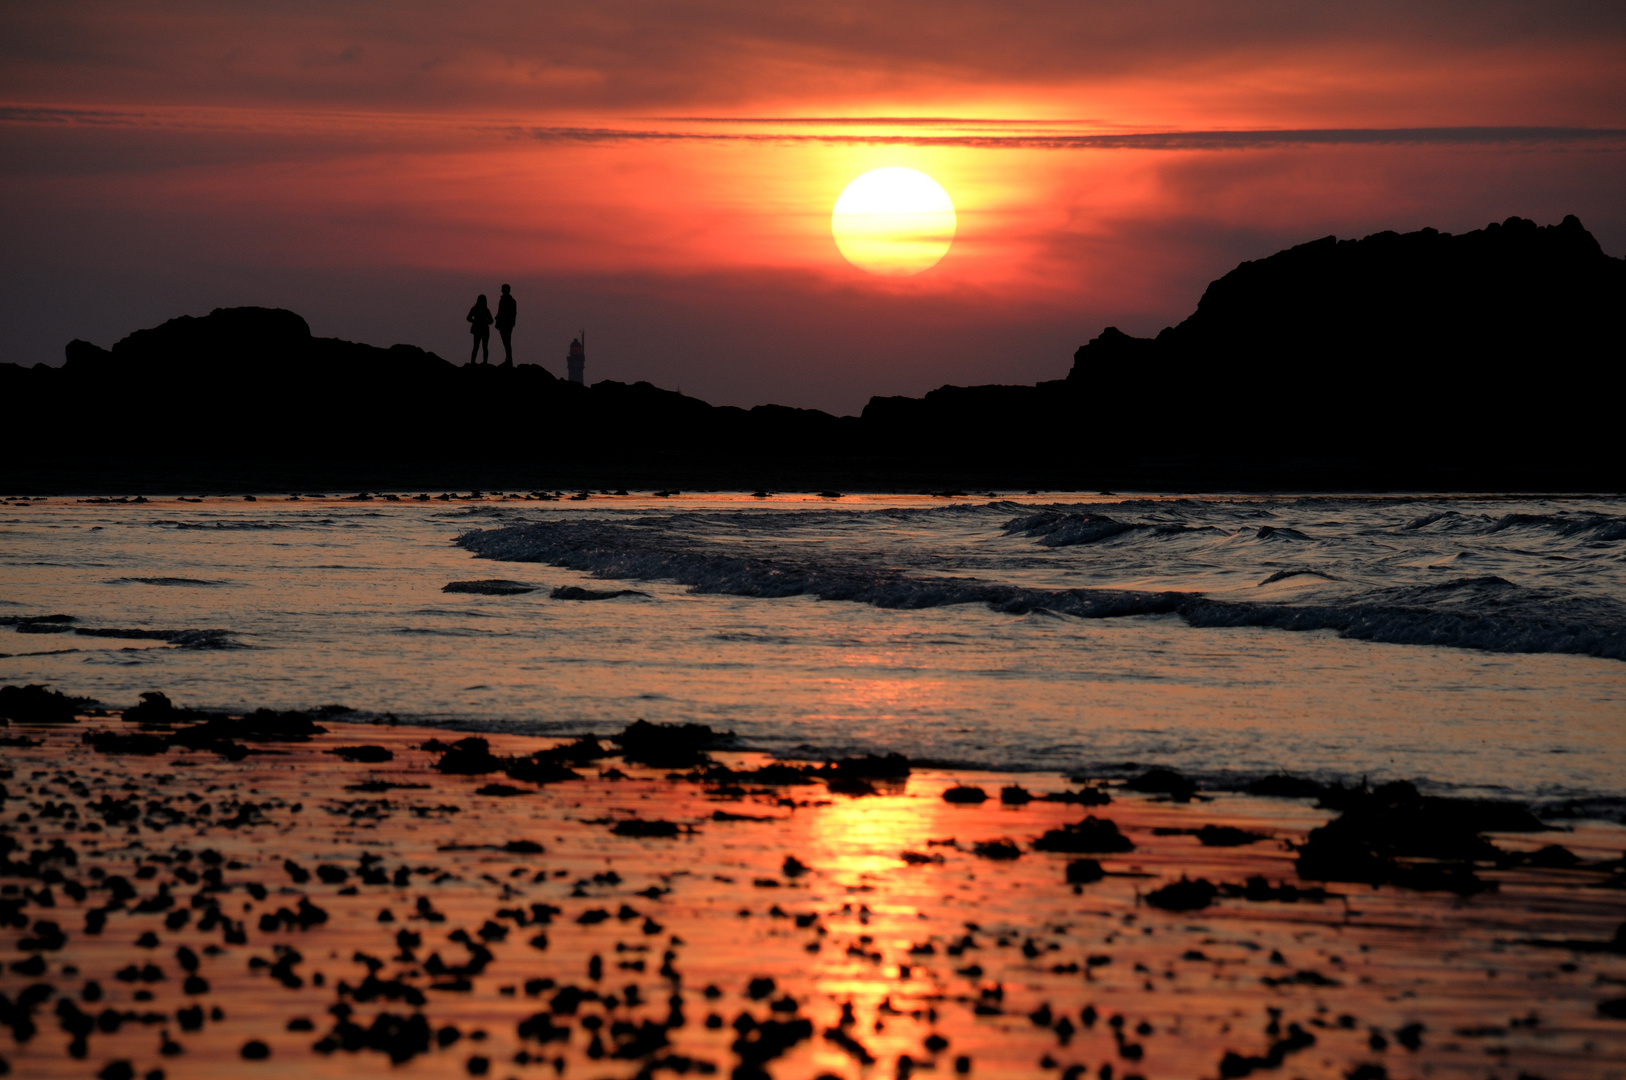 Sonnenuntergang St. Malo 2014